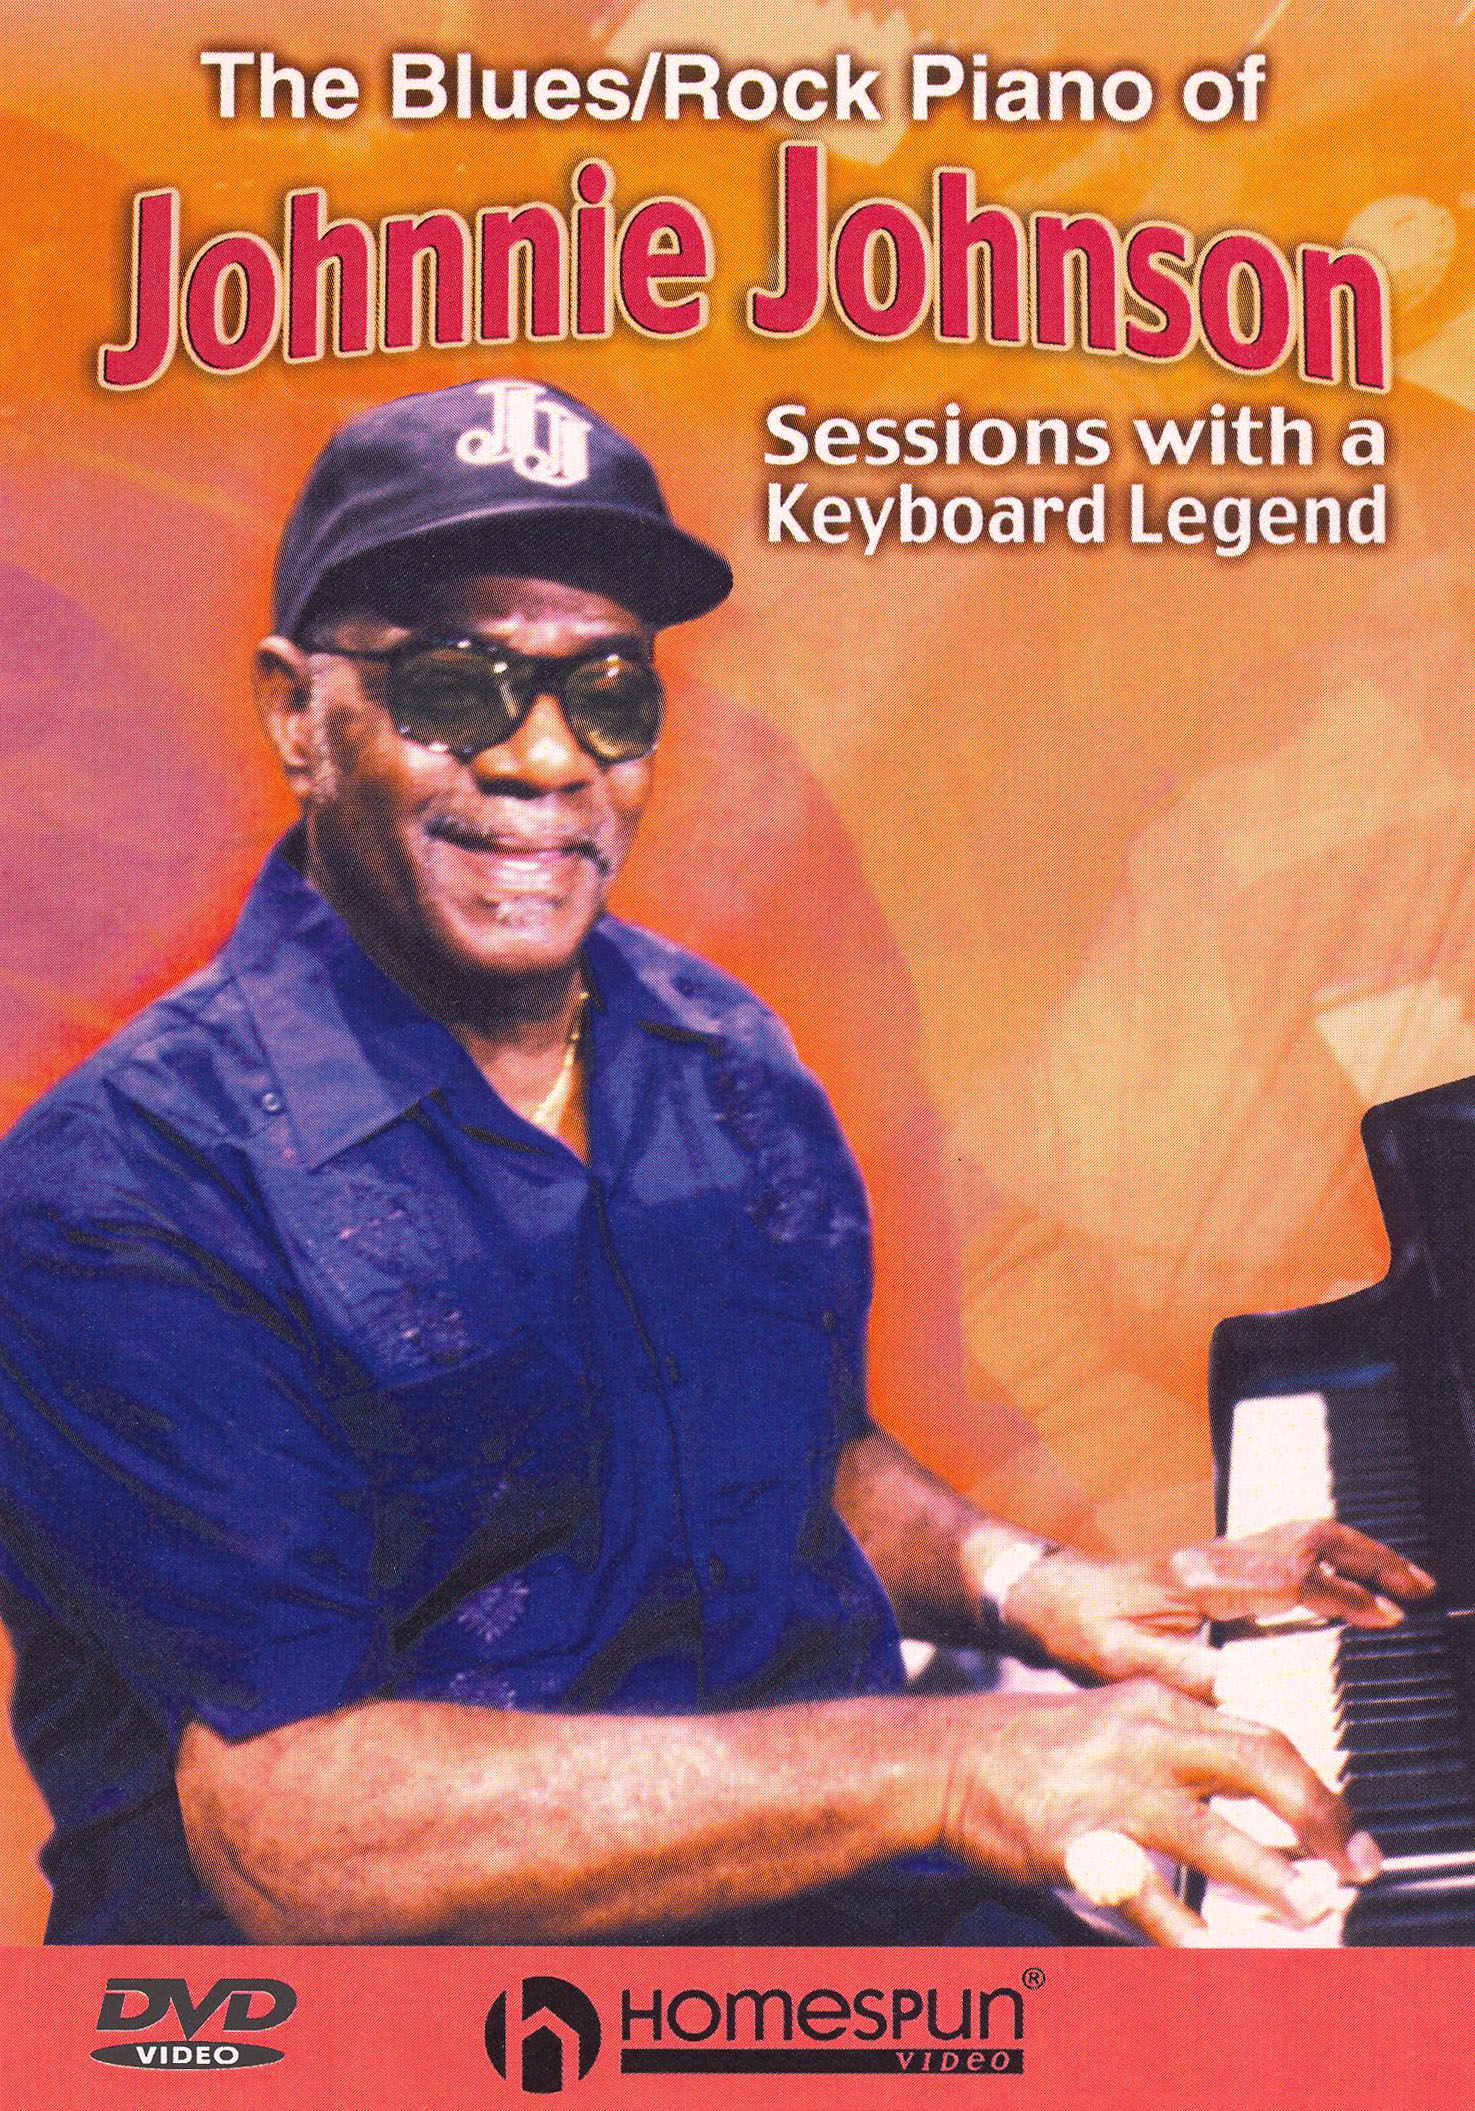 Blues/Rock Piano of Johnnie Johnson